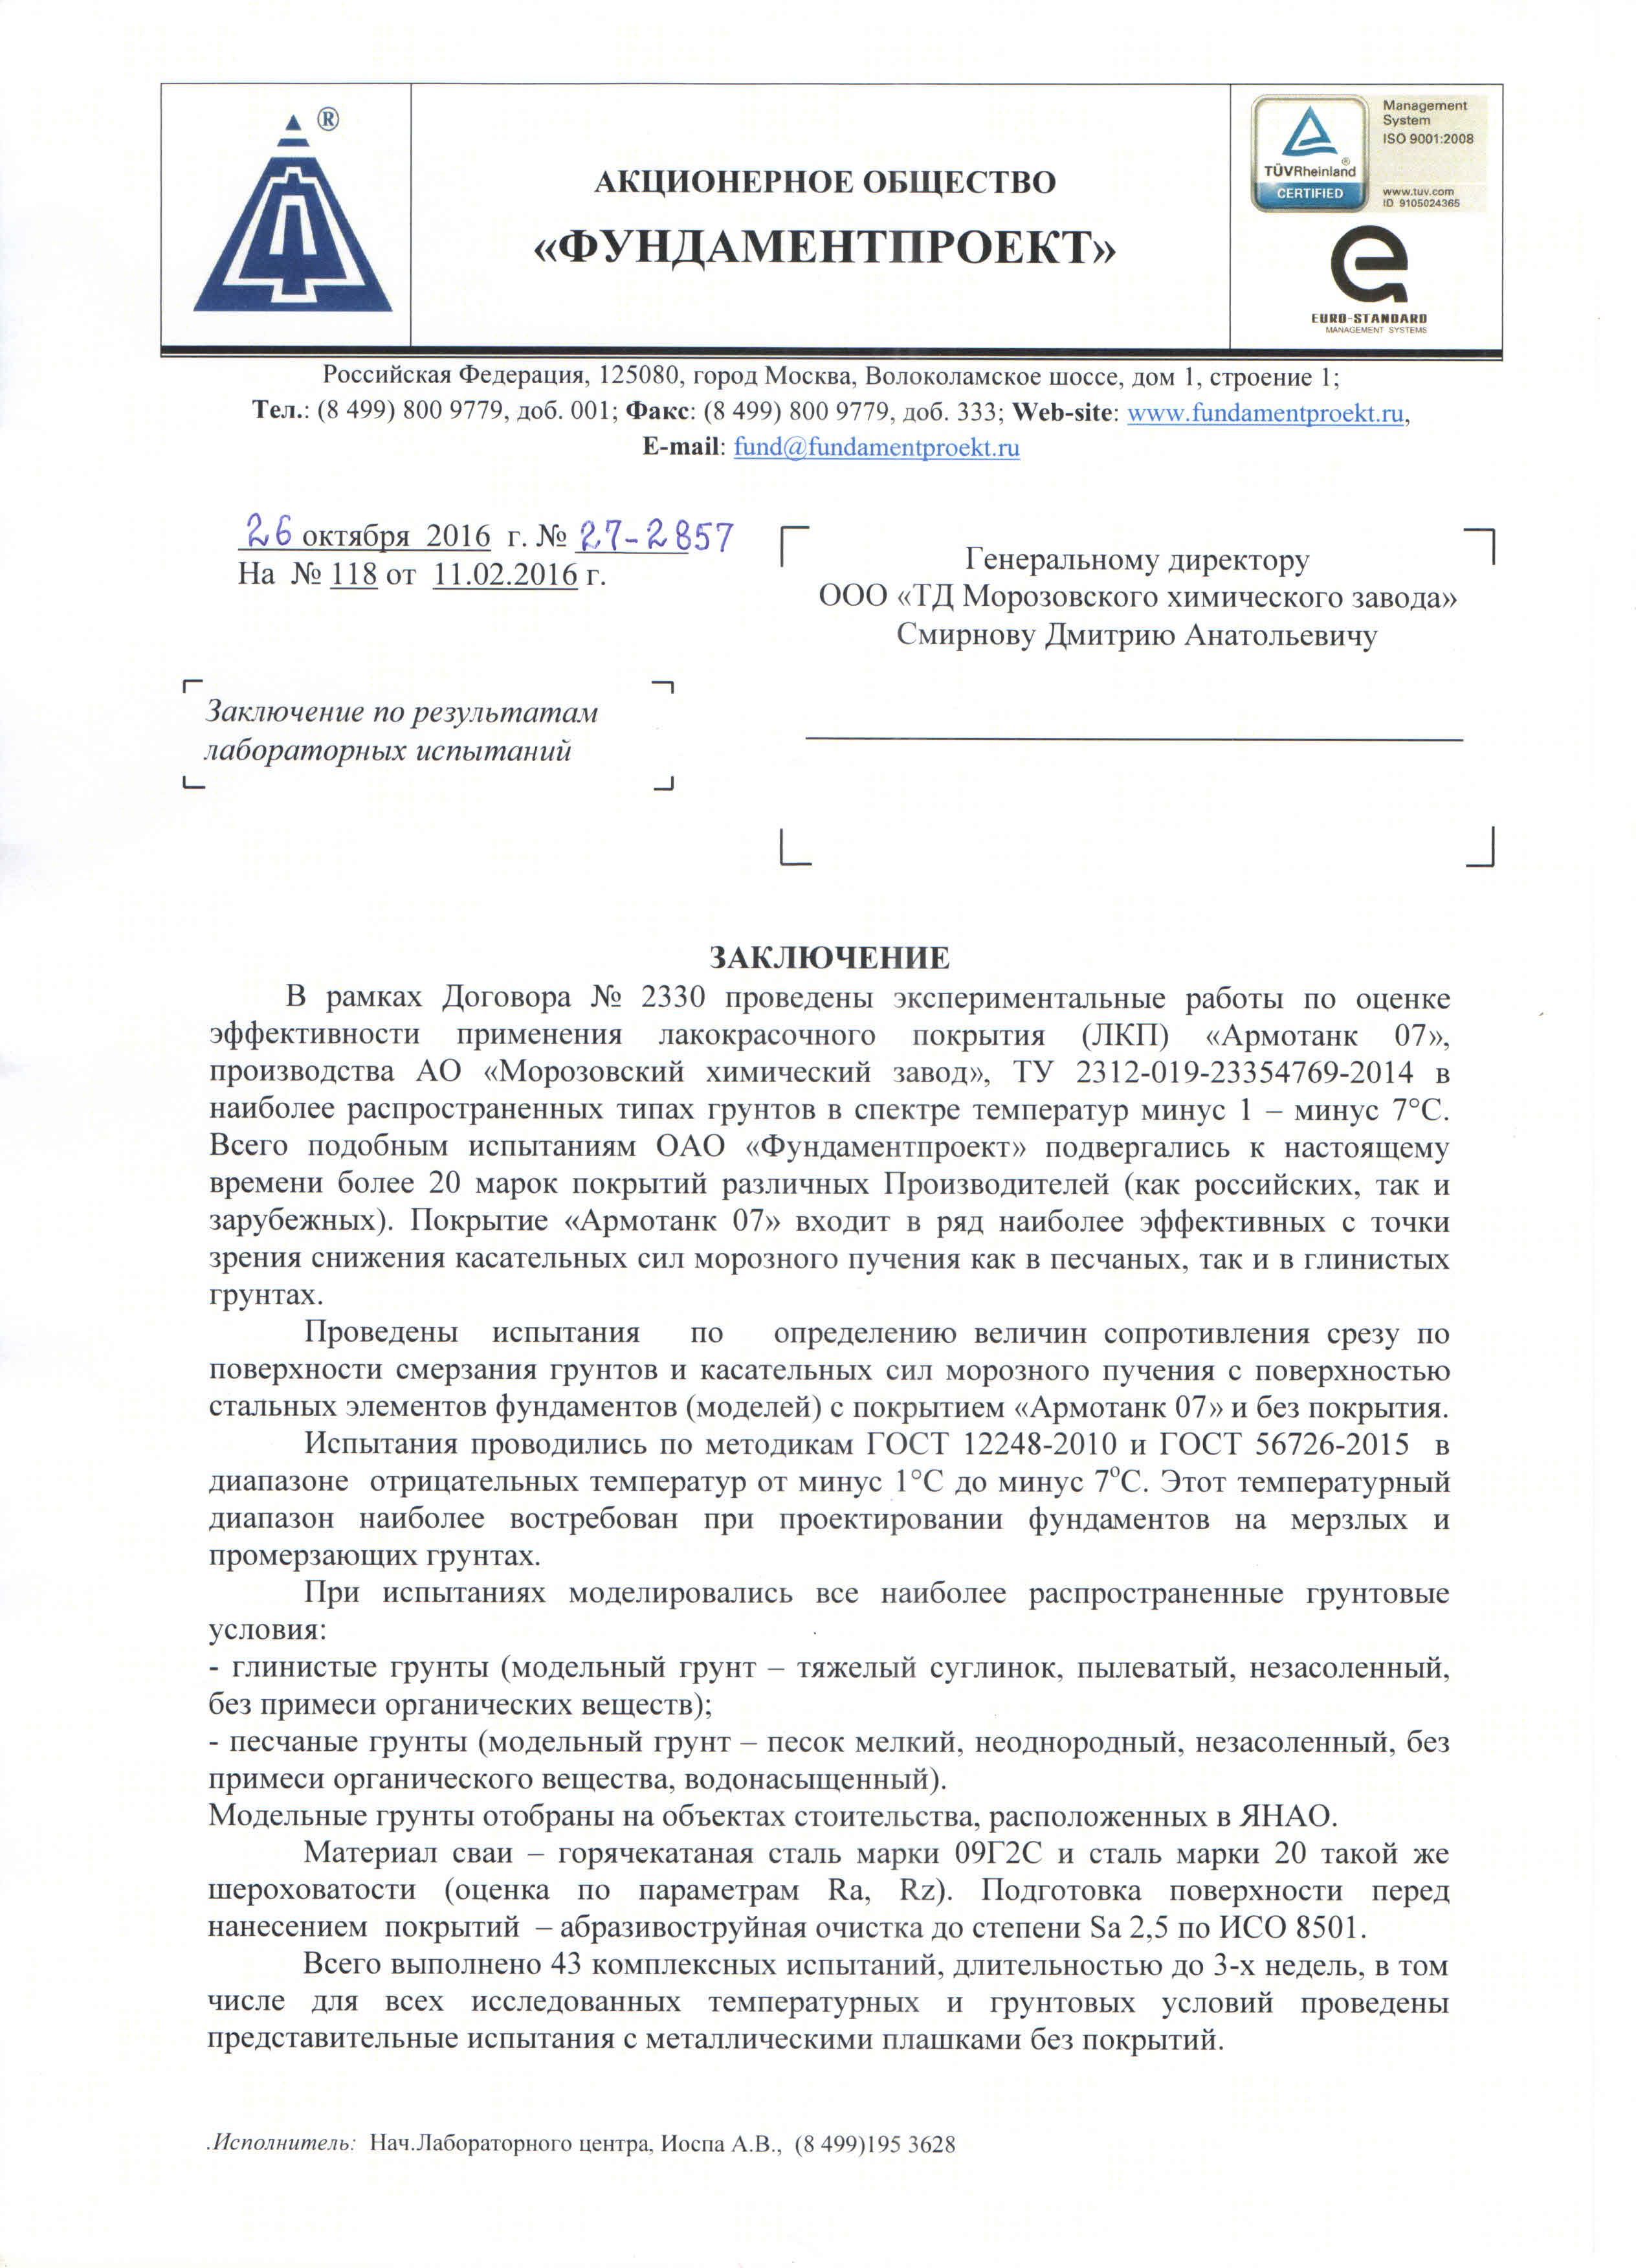 Заключение Фундаментпроект Армотанк 07_Страница_1